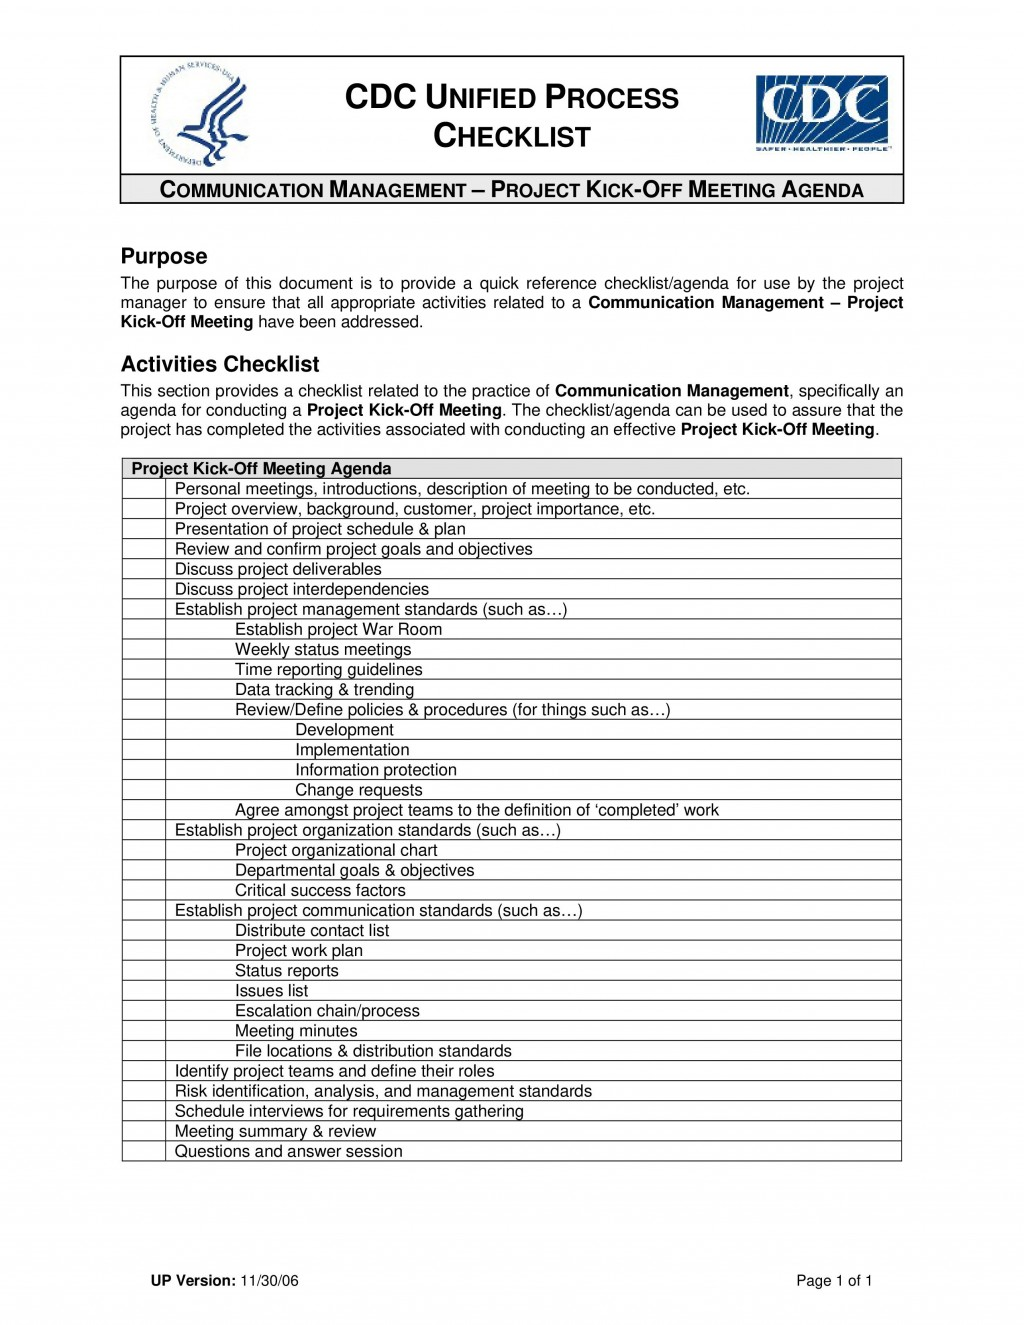 002 Beautiful Kick Off Meeting Template Image  Invitation Email Agenda Project ManagementLarge